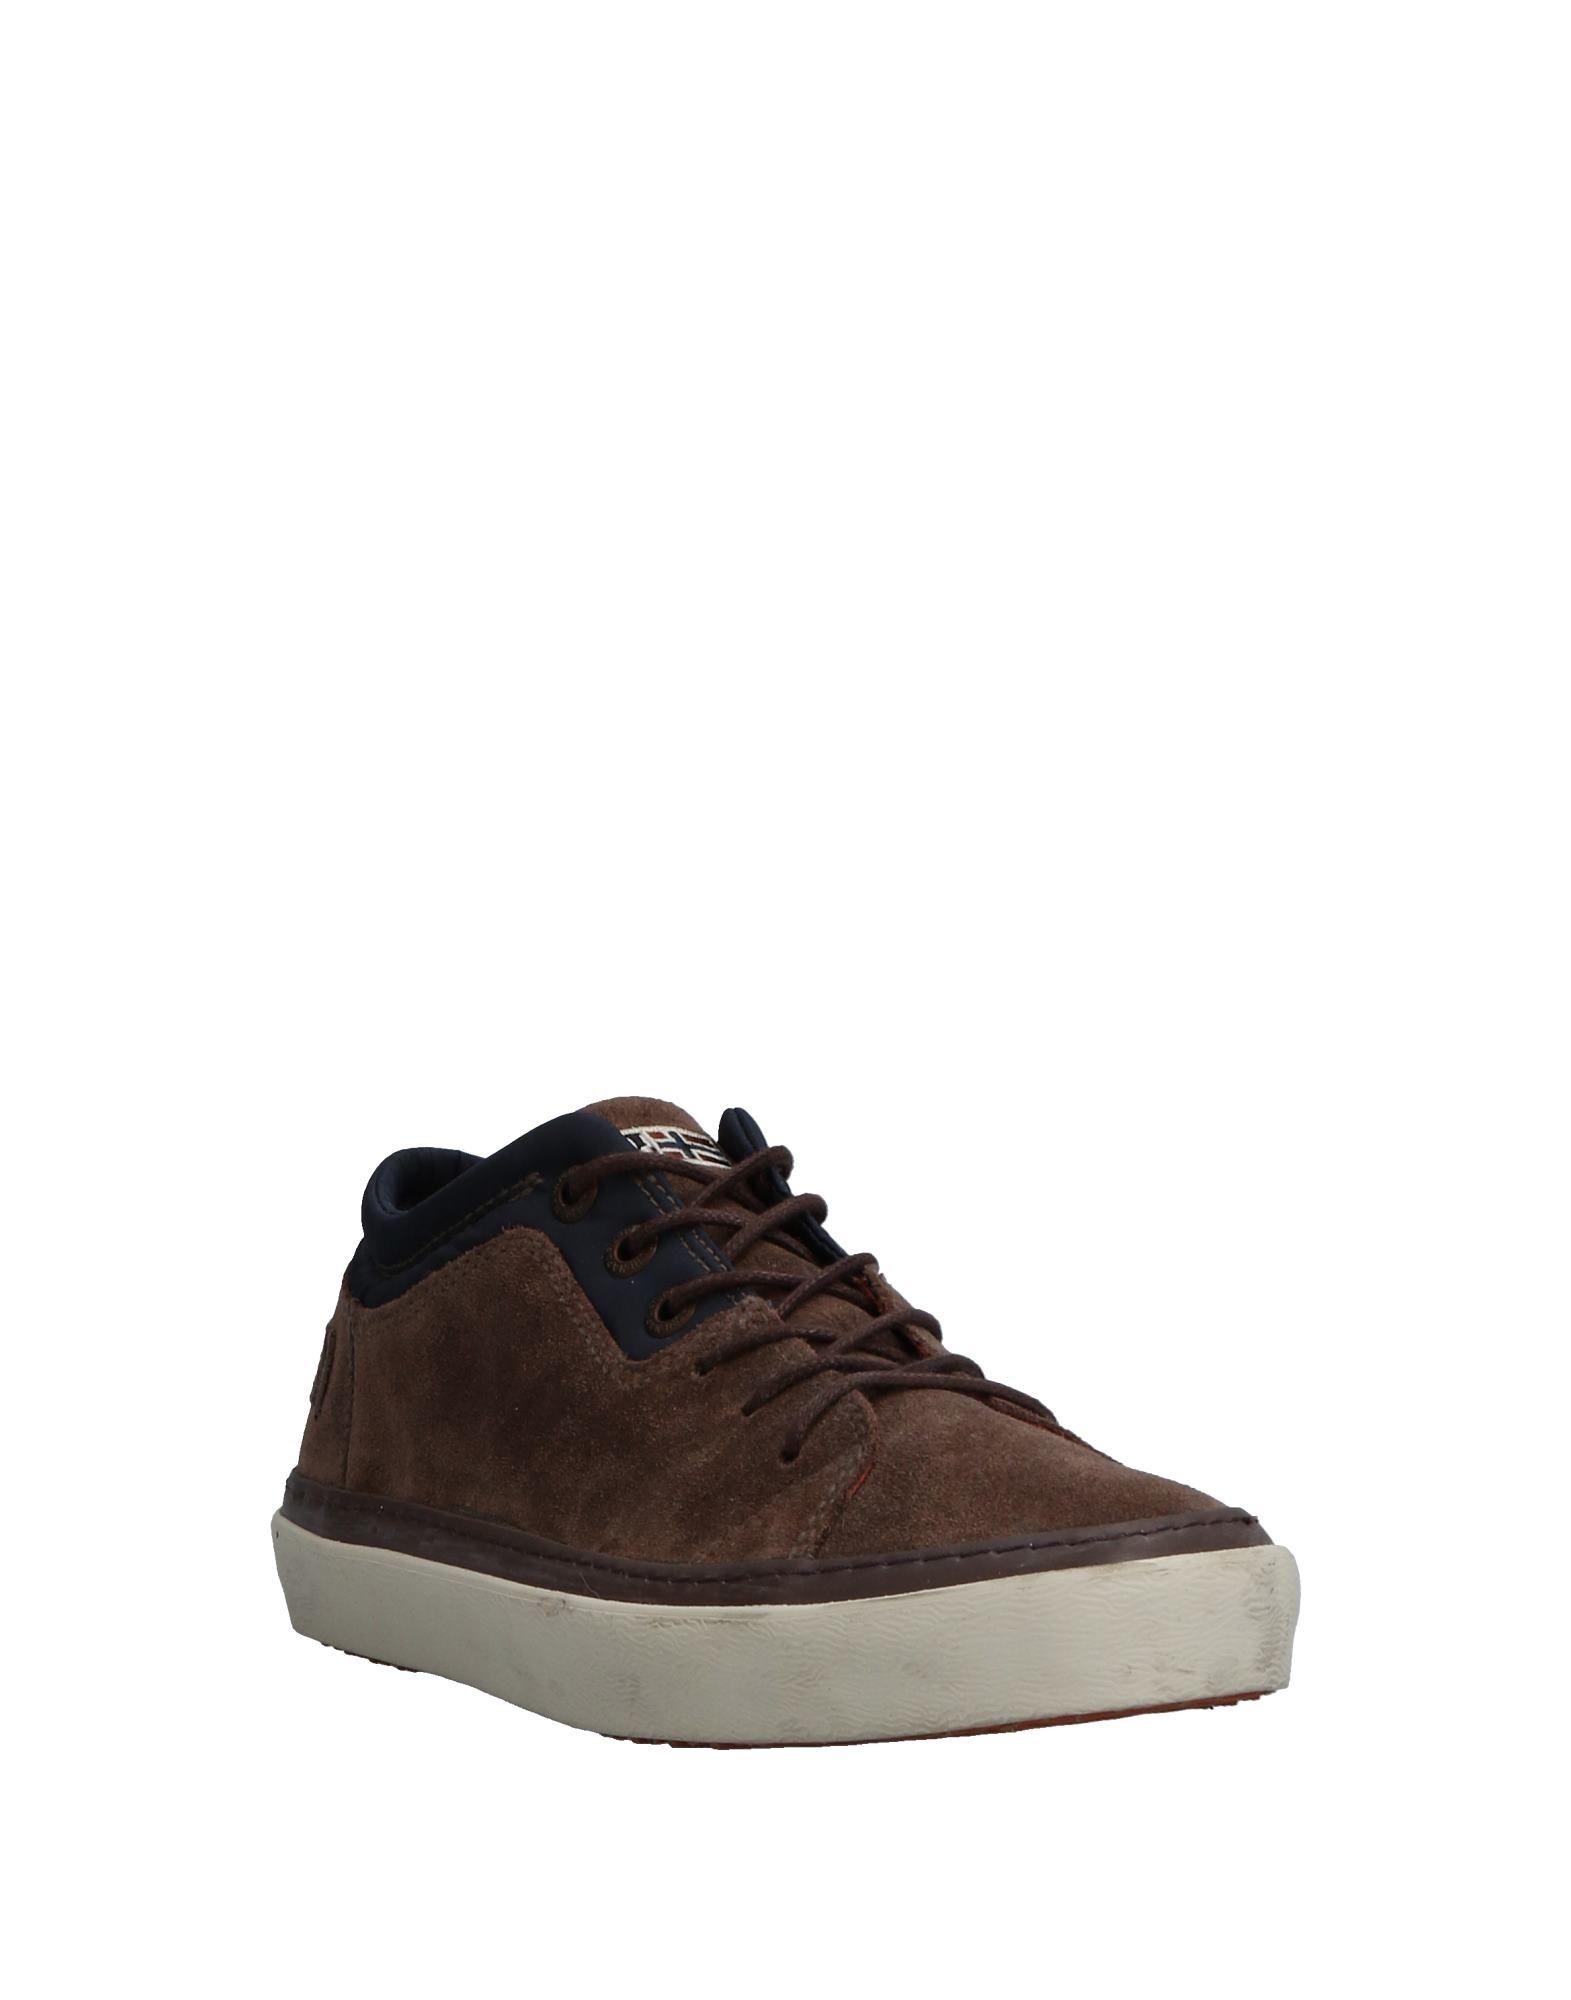 Sneakers Napapijri - Uomo - Napapijri 11527486CN elegante 19bbbd